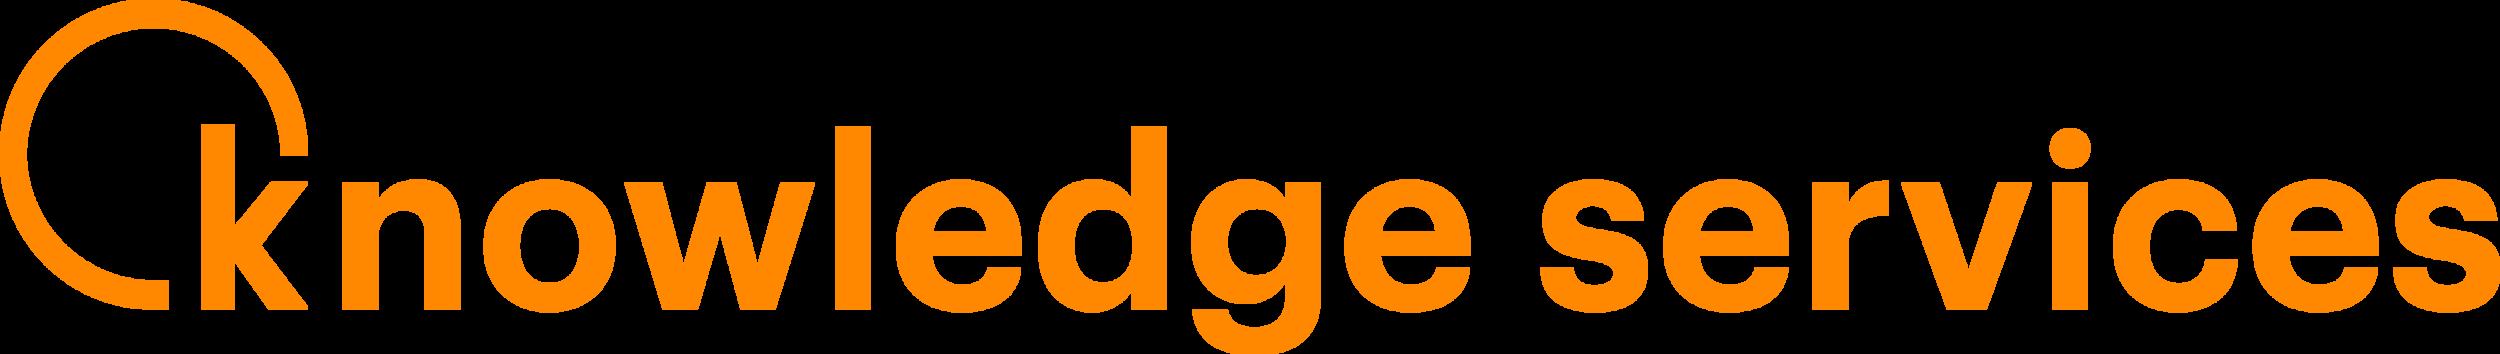 Knowledge Services Logotype_Orange.png